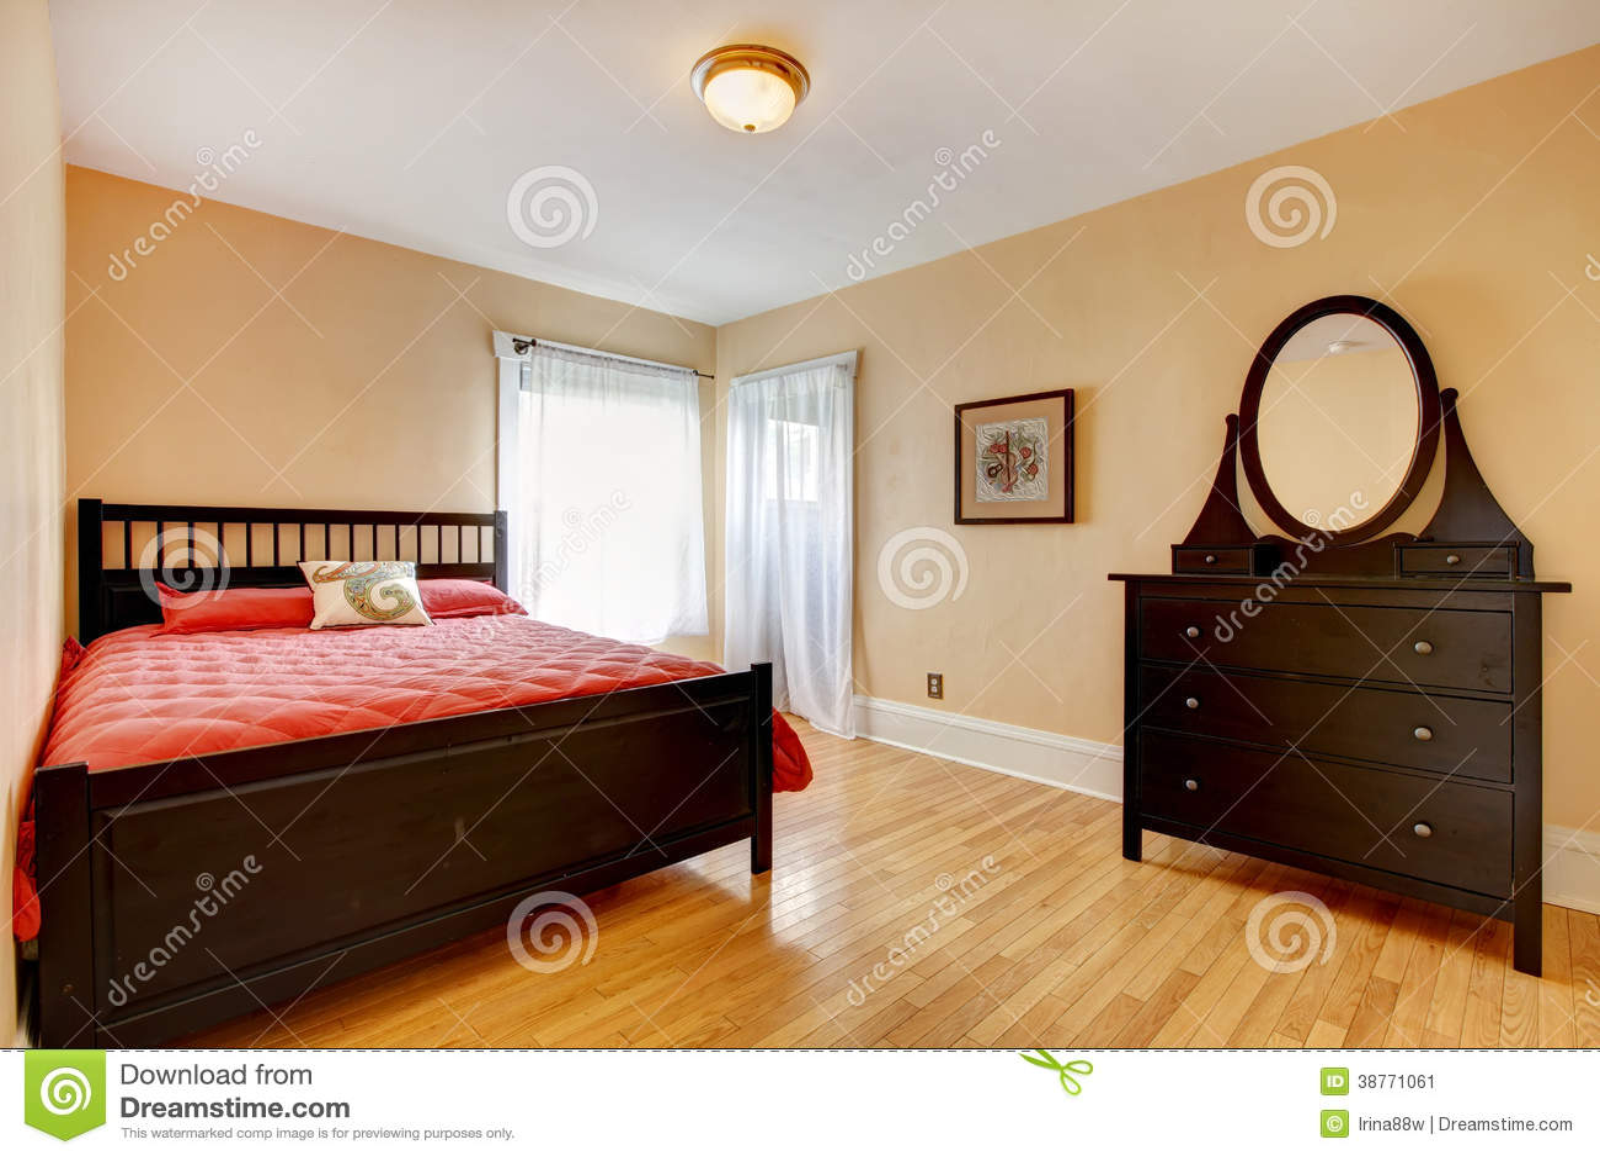 Beautiful Goth Bedrooms With Wood Floor: Beautiful Bedroom With Dark Brown Furniture Stock Image